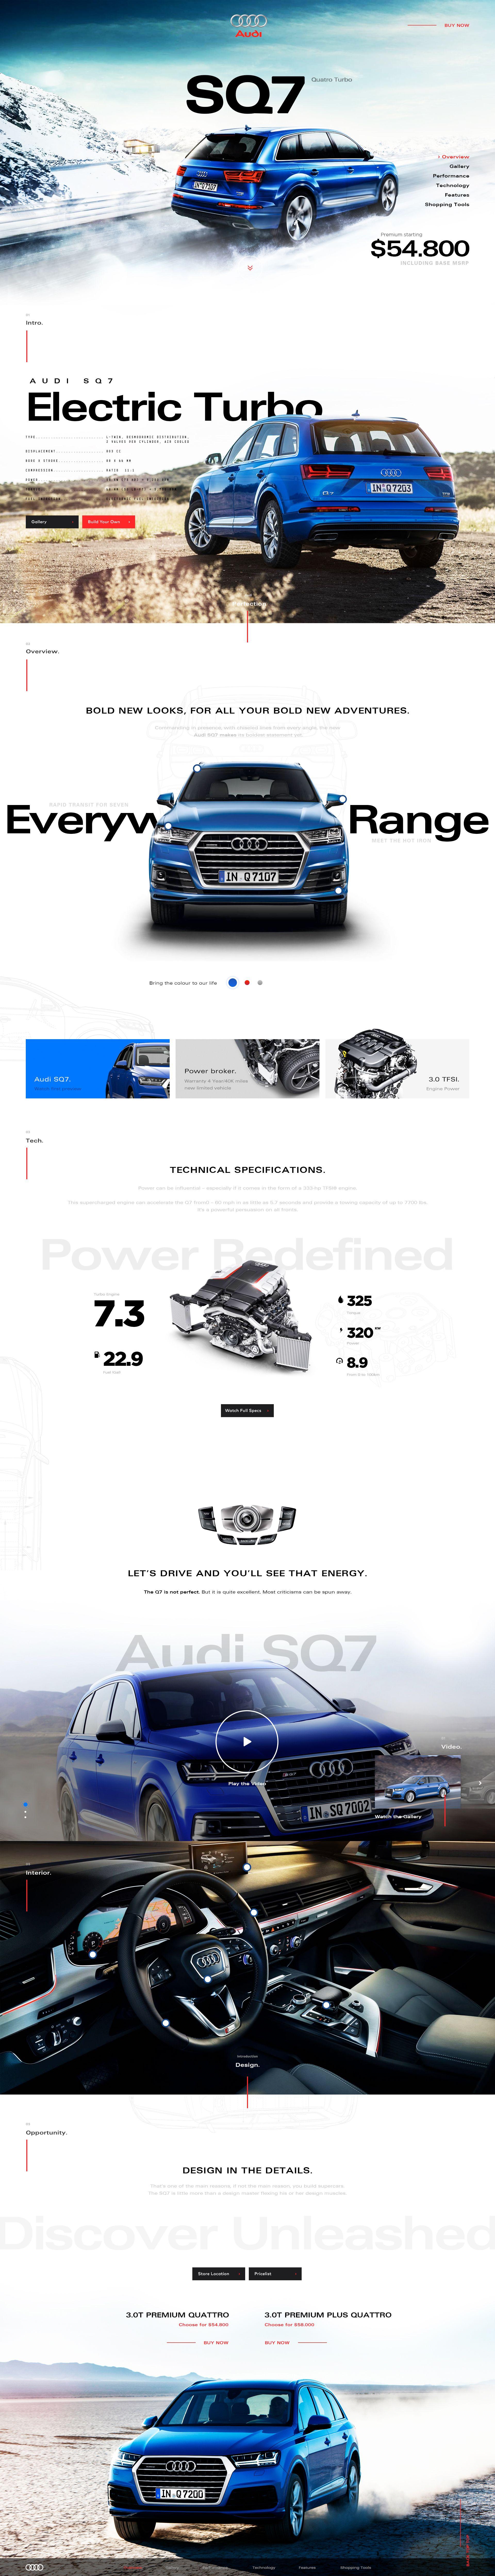 Automotive Web Websiste Inspiration Design Web Layout Design Web Design User Experience Interactive Design